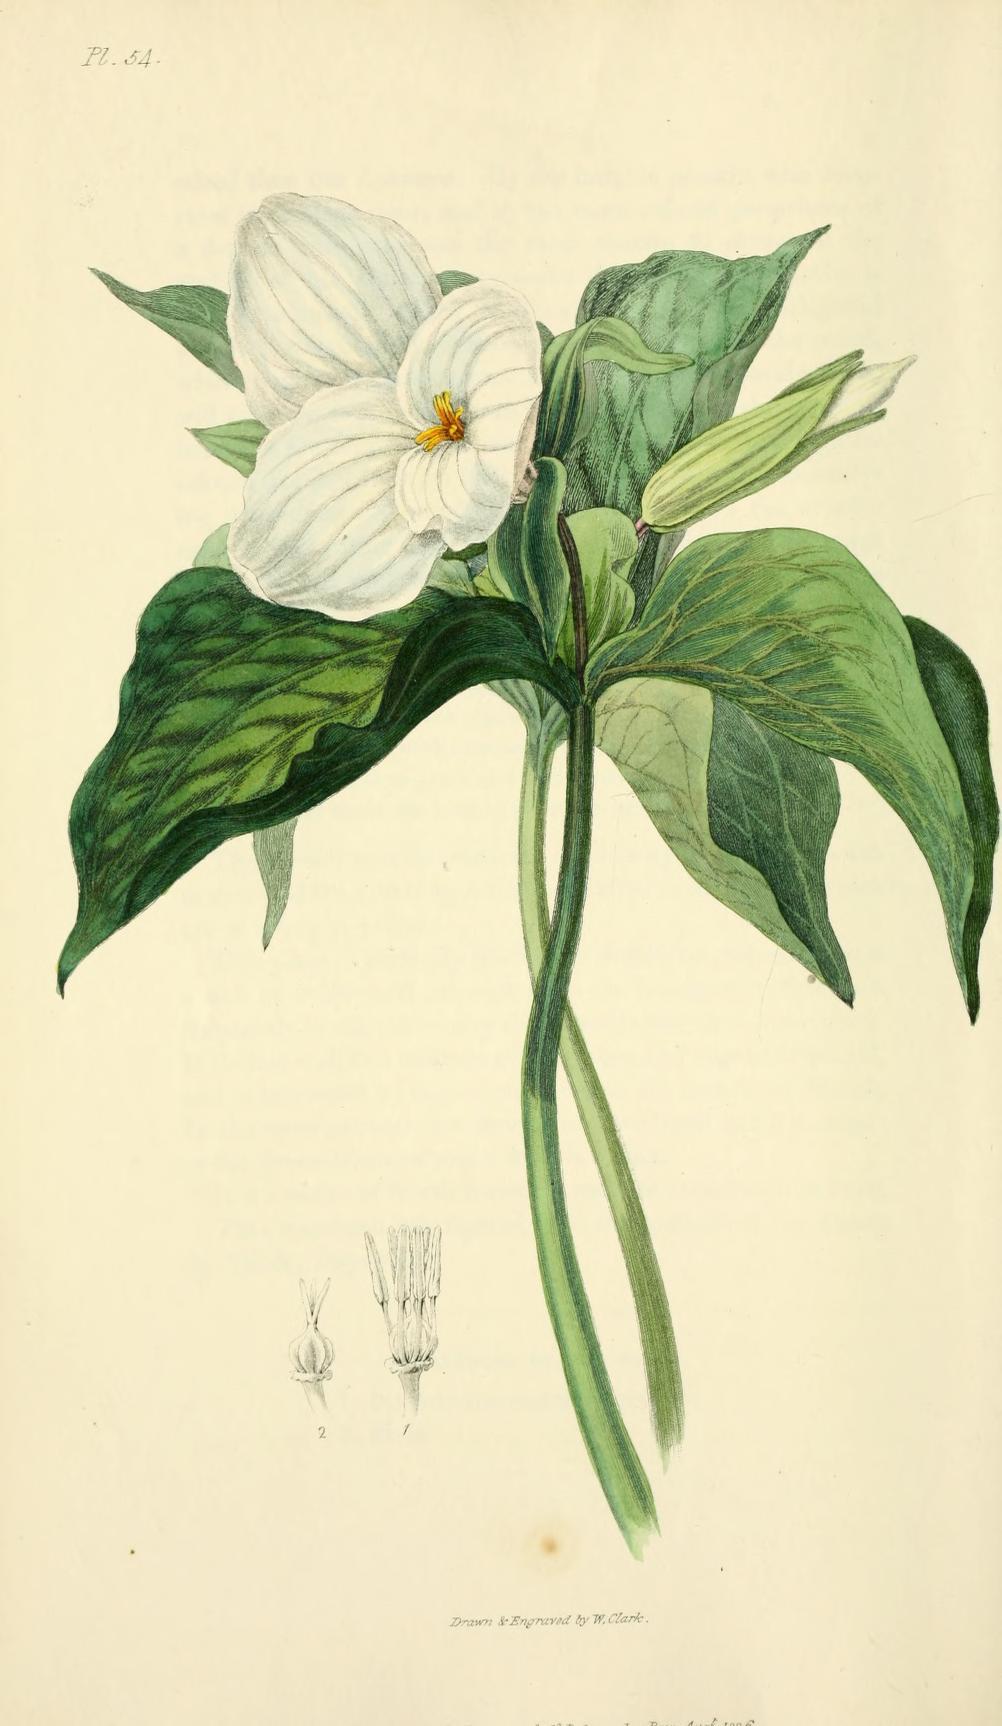 """Large-flowered Trillium."" Plate 54."